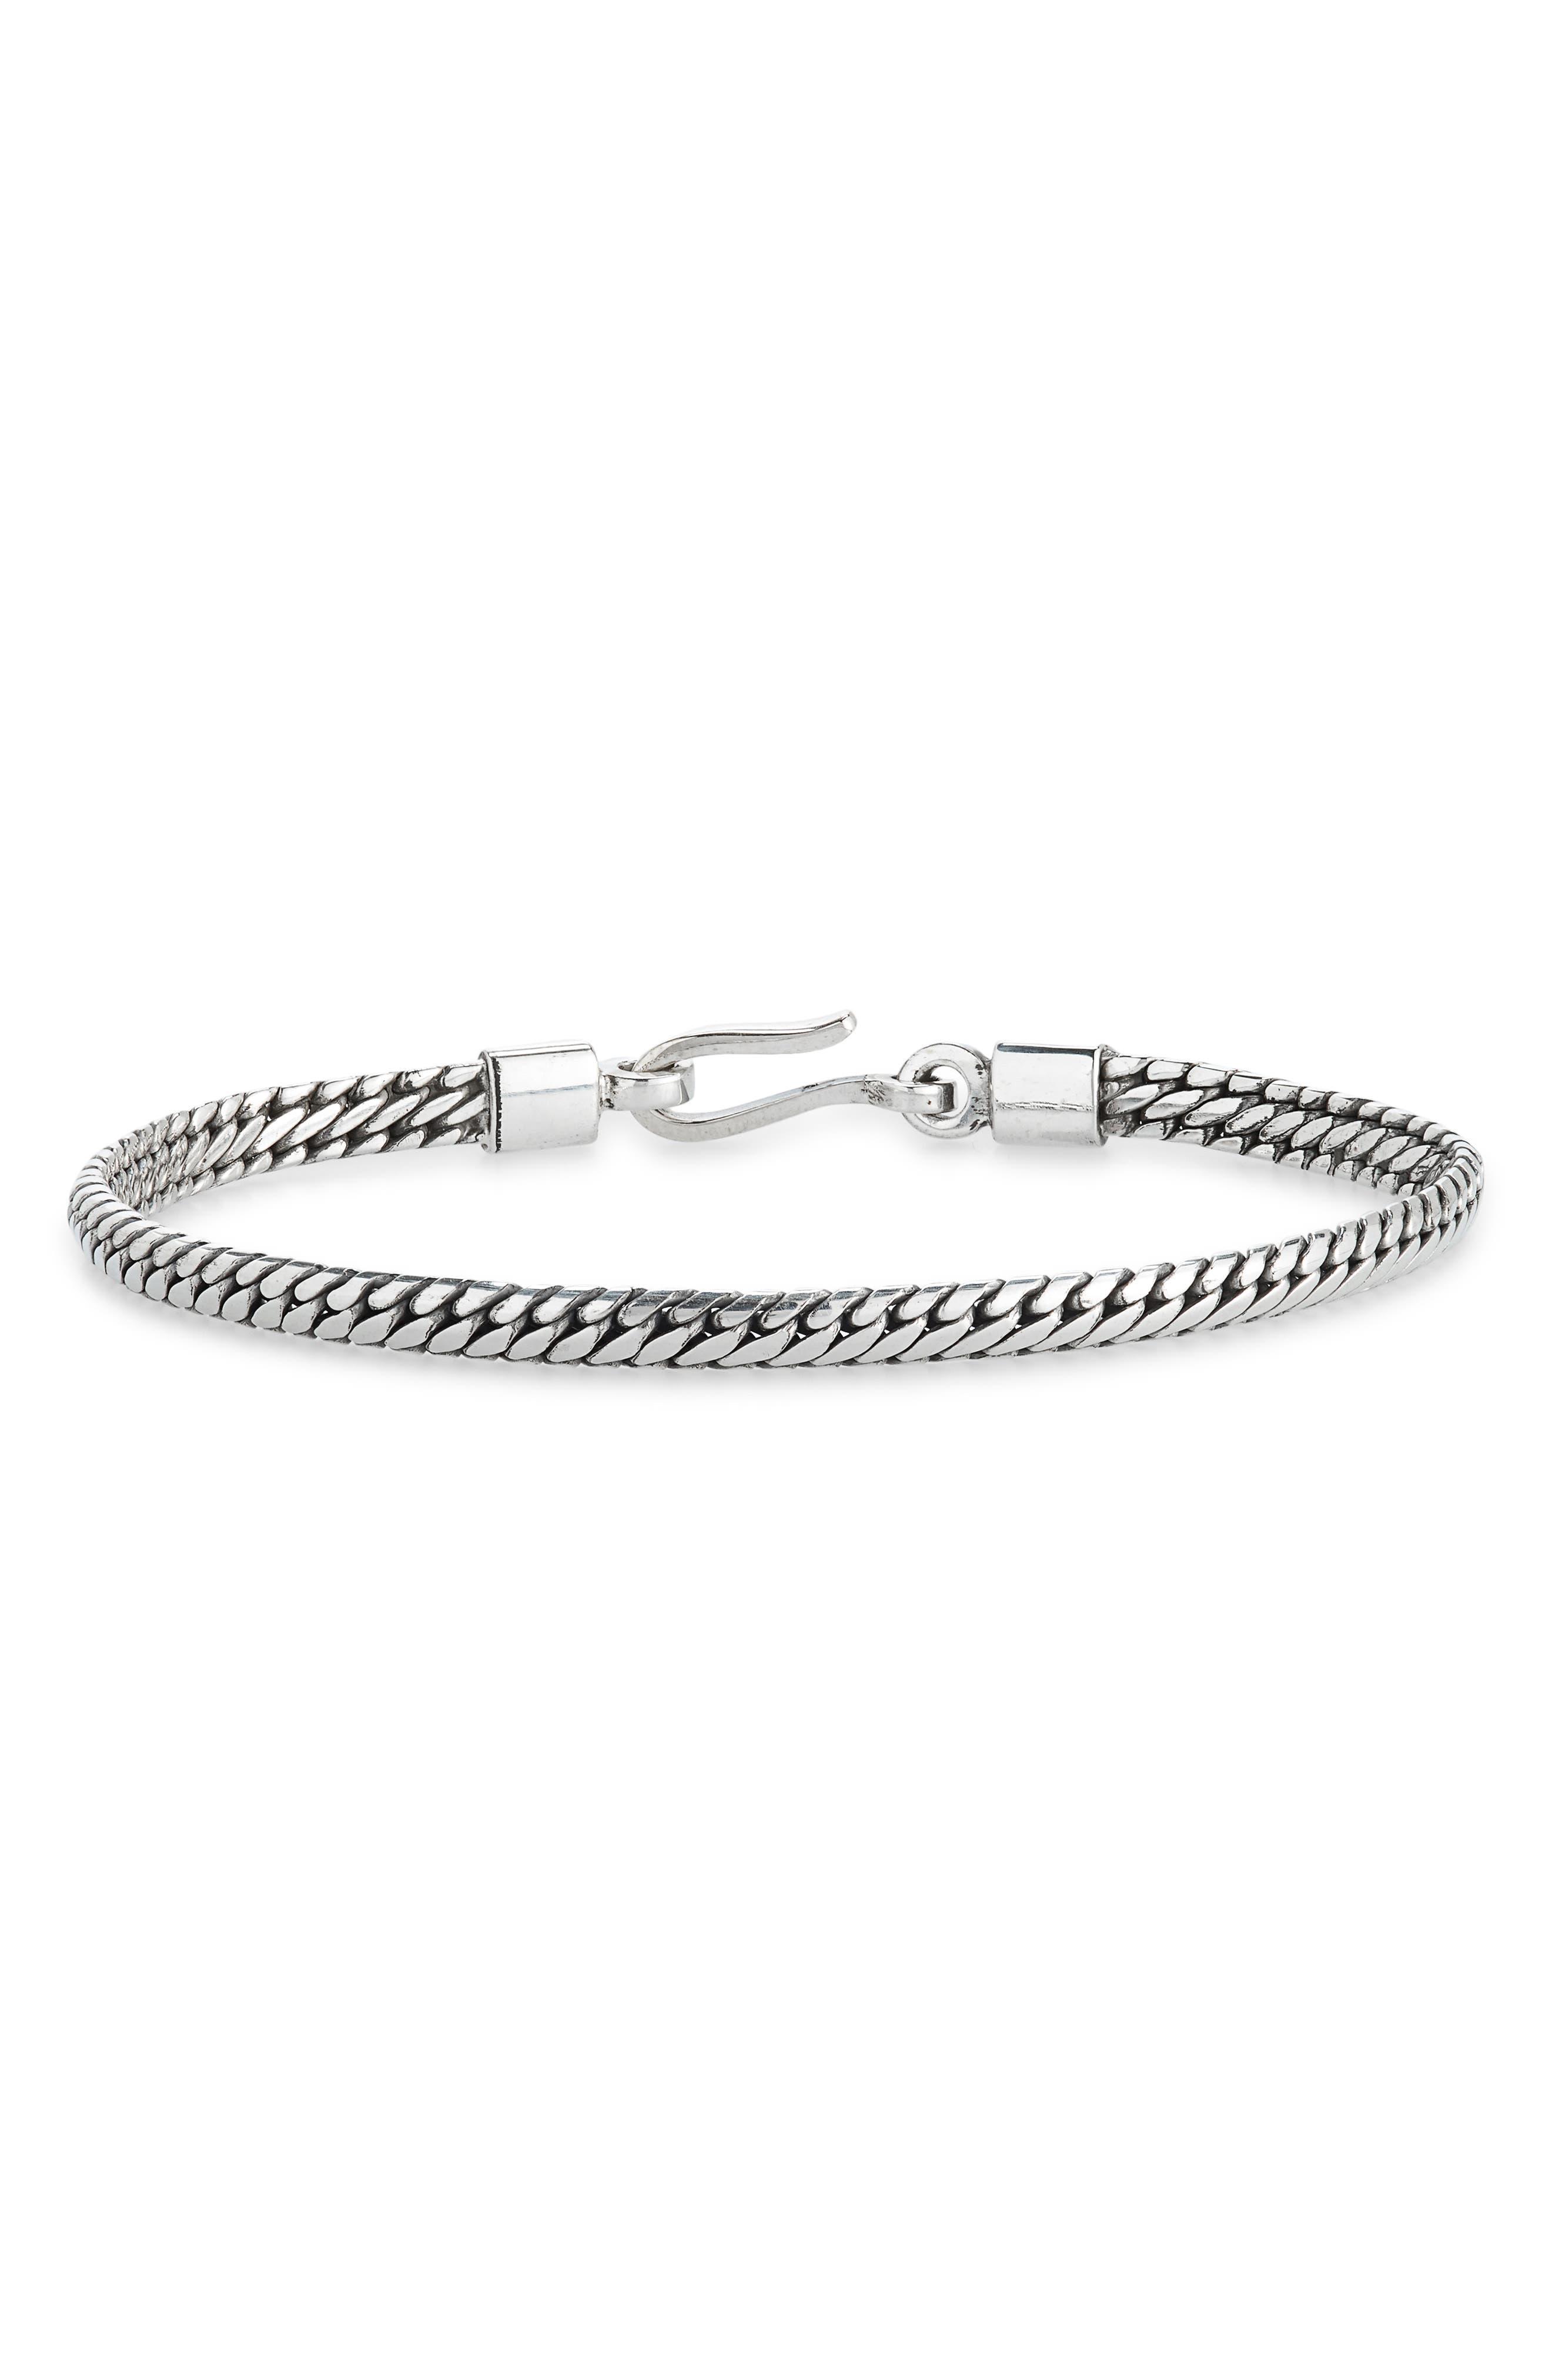 Men's Bali Chain Bracelet